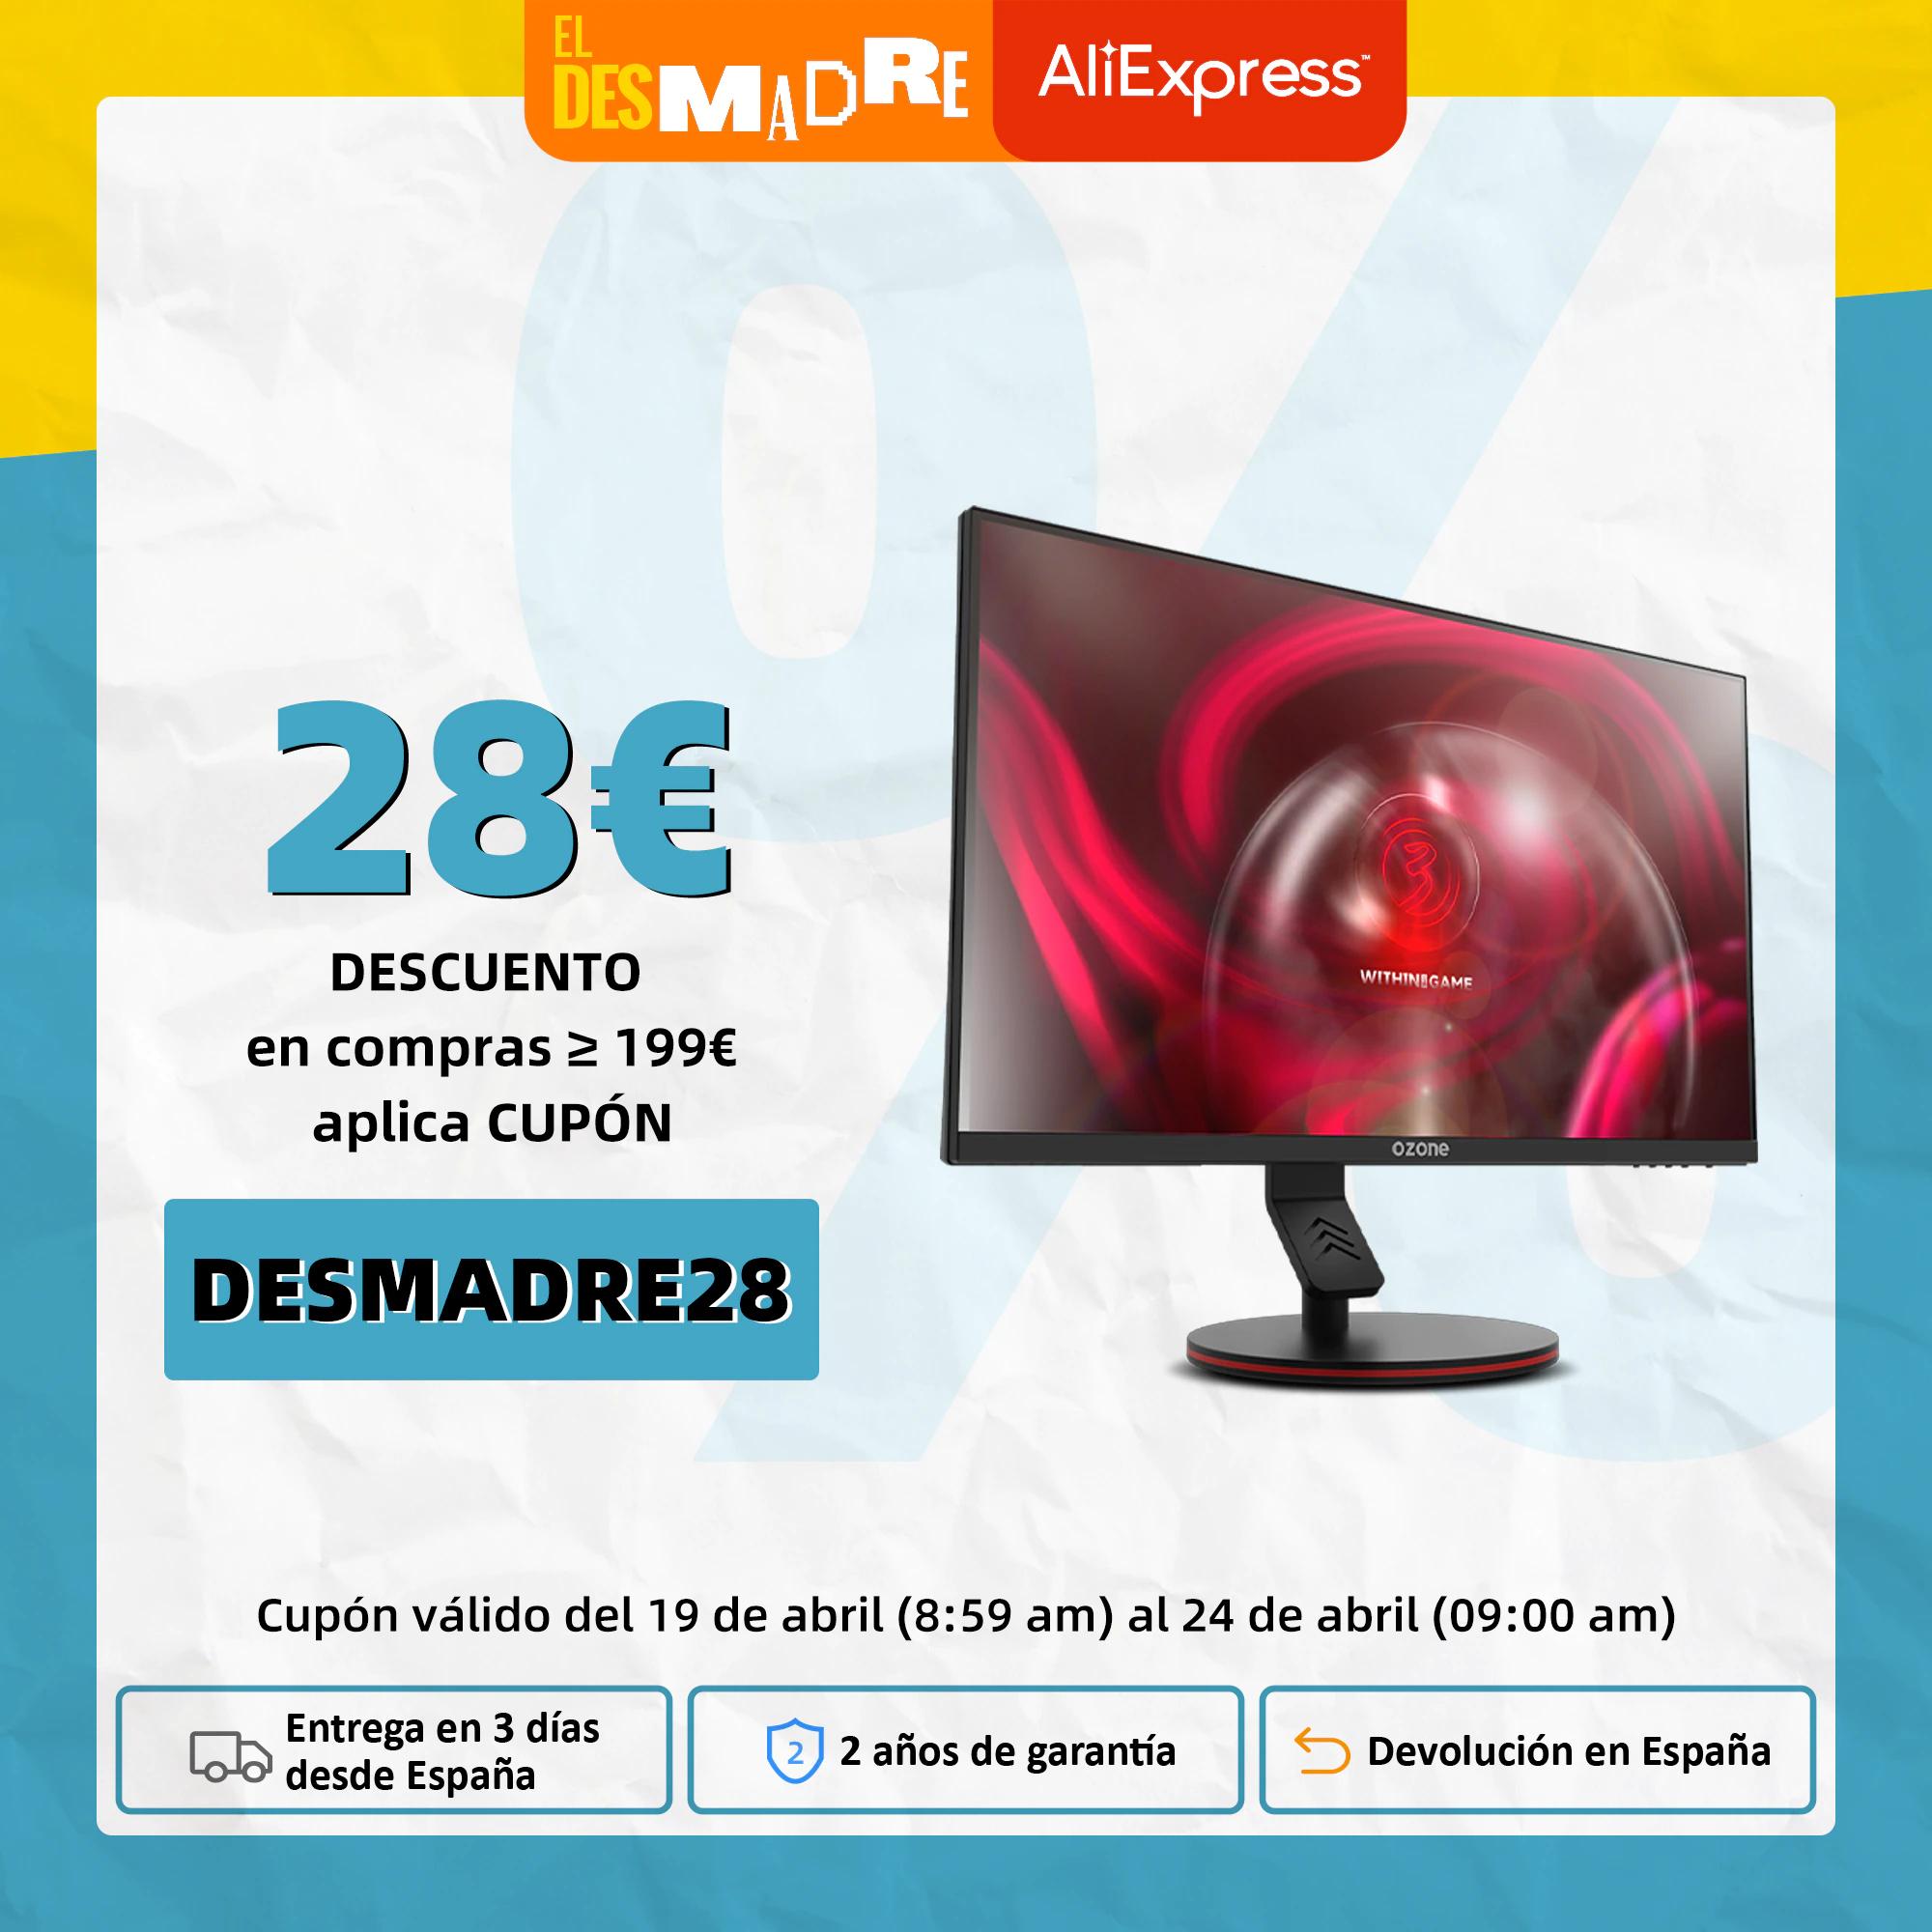 "Monitor OZONE 24,5"" FHD 144Hz 1ms Freesync/G-Sync HDR (Desde España)"